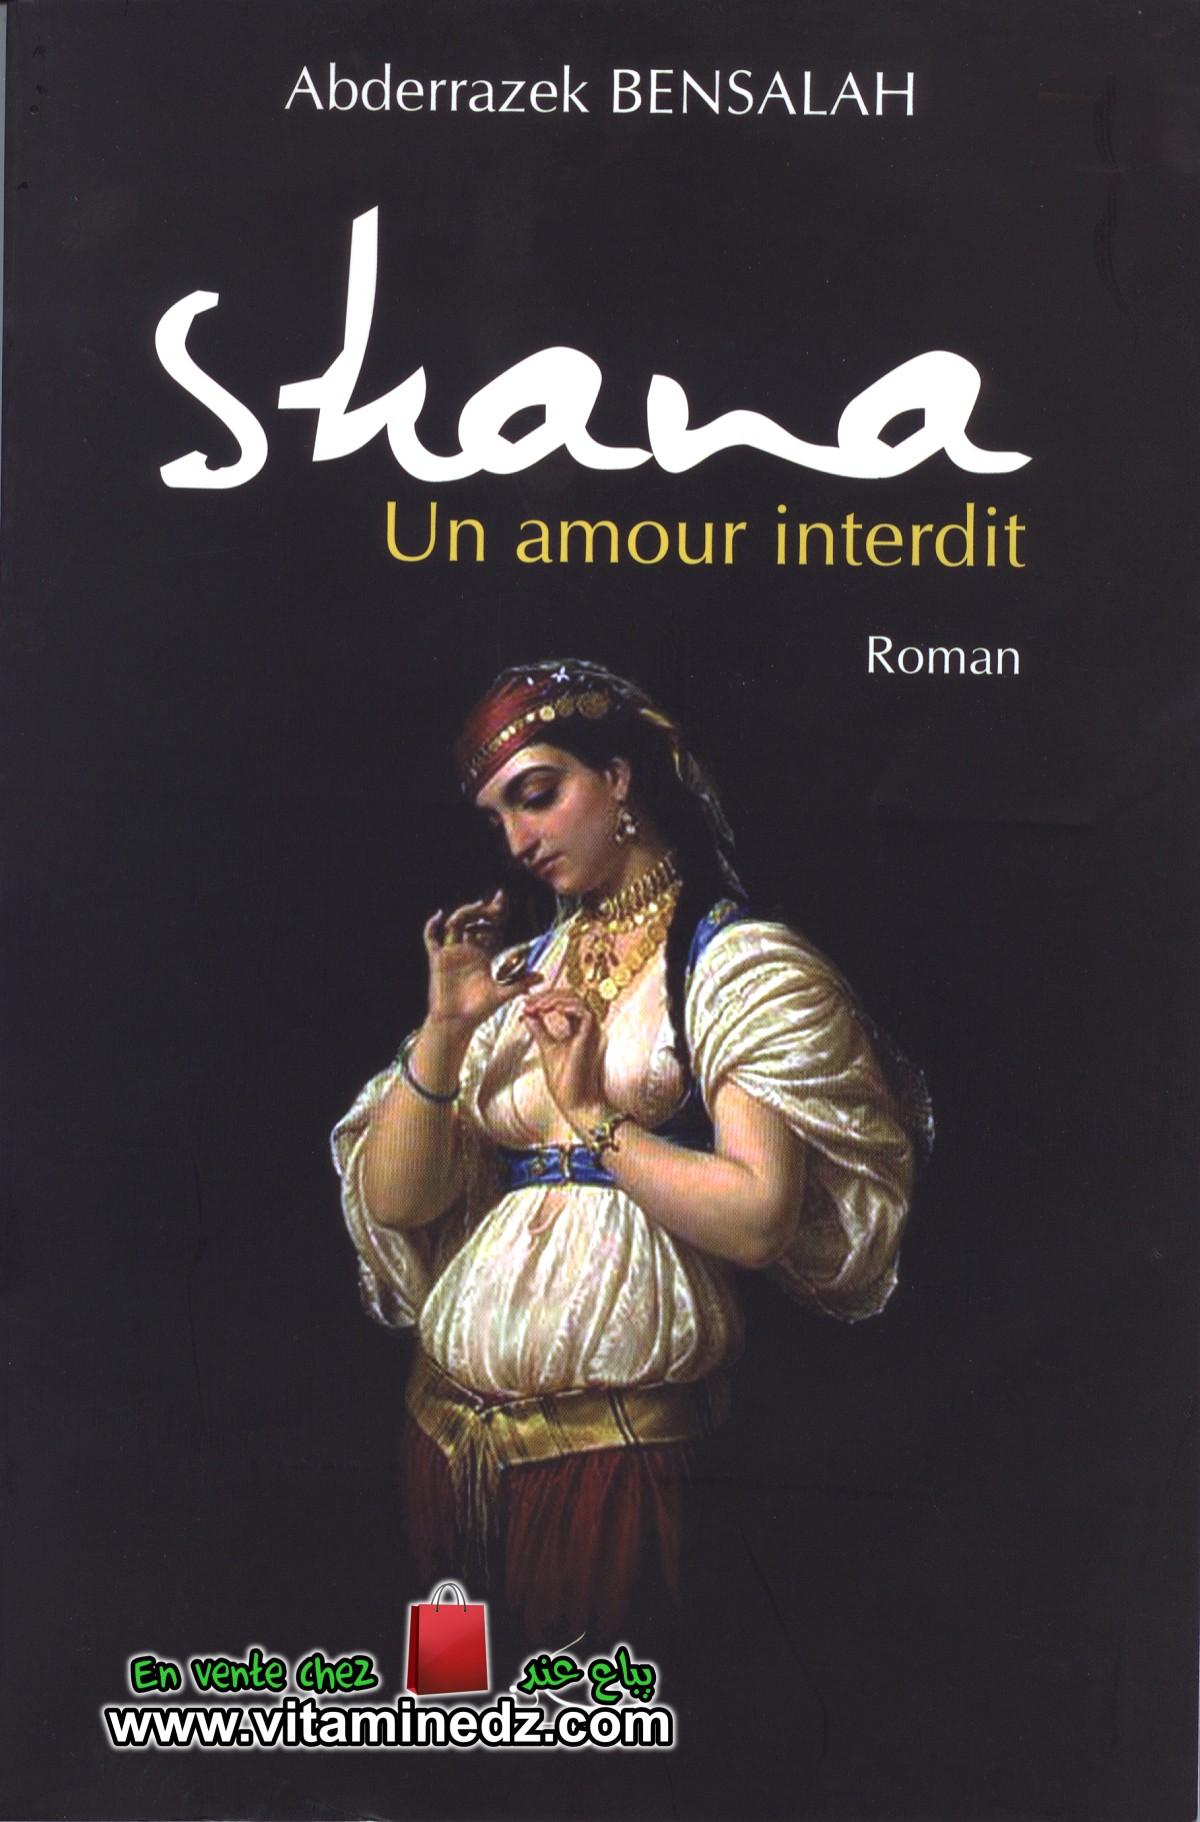 Shana, un amour interdit - Abderrazek Bensalah